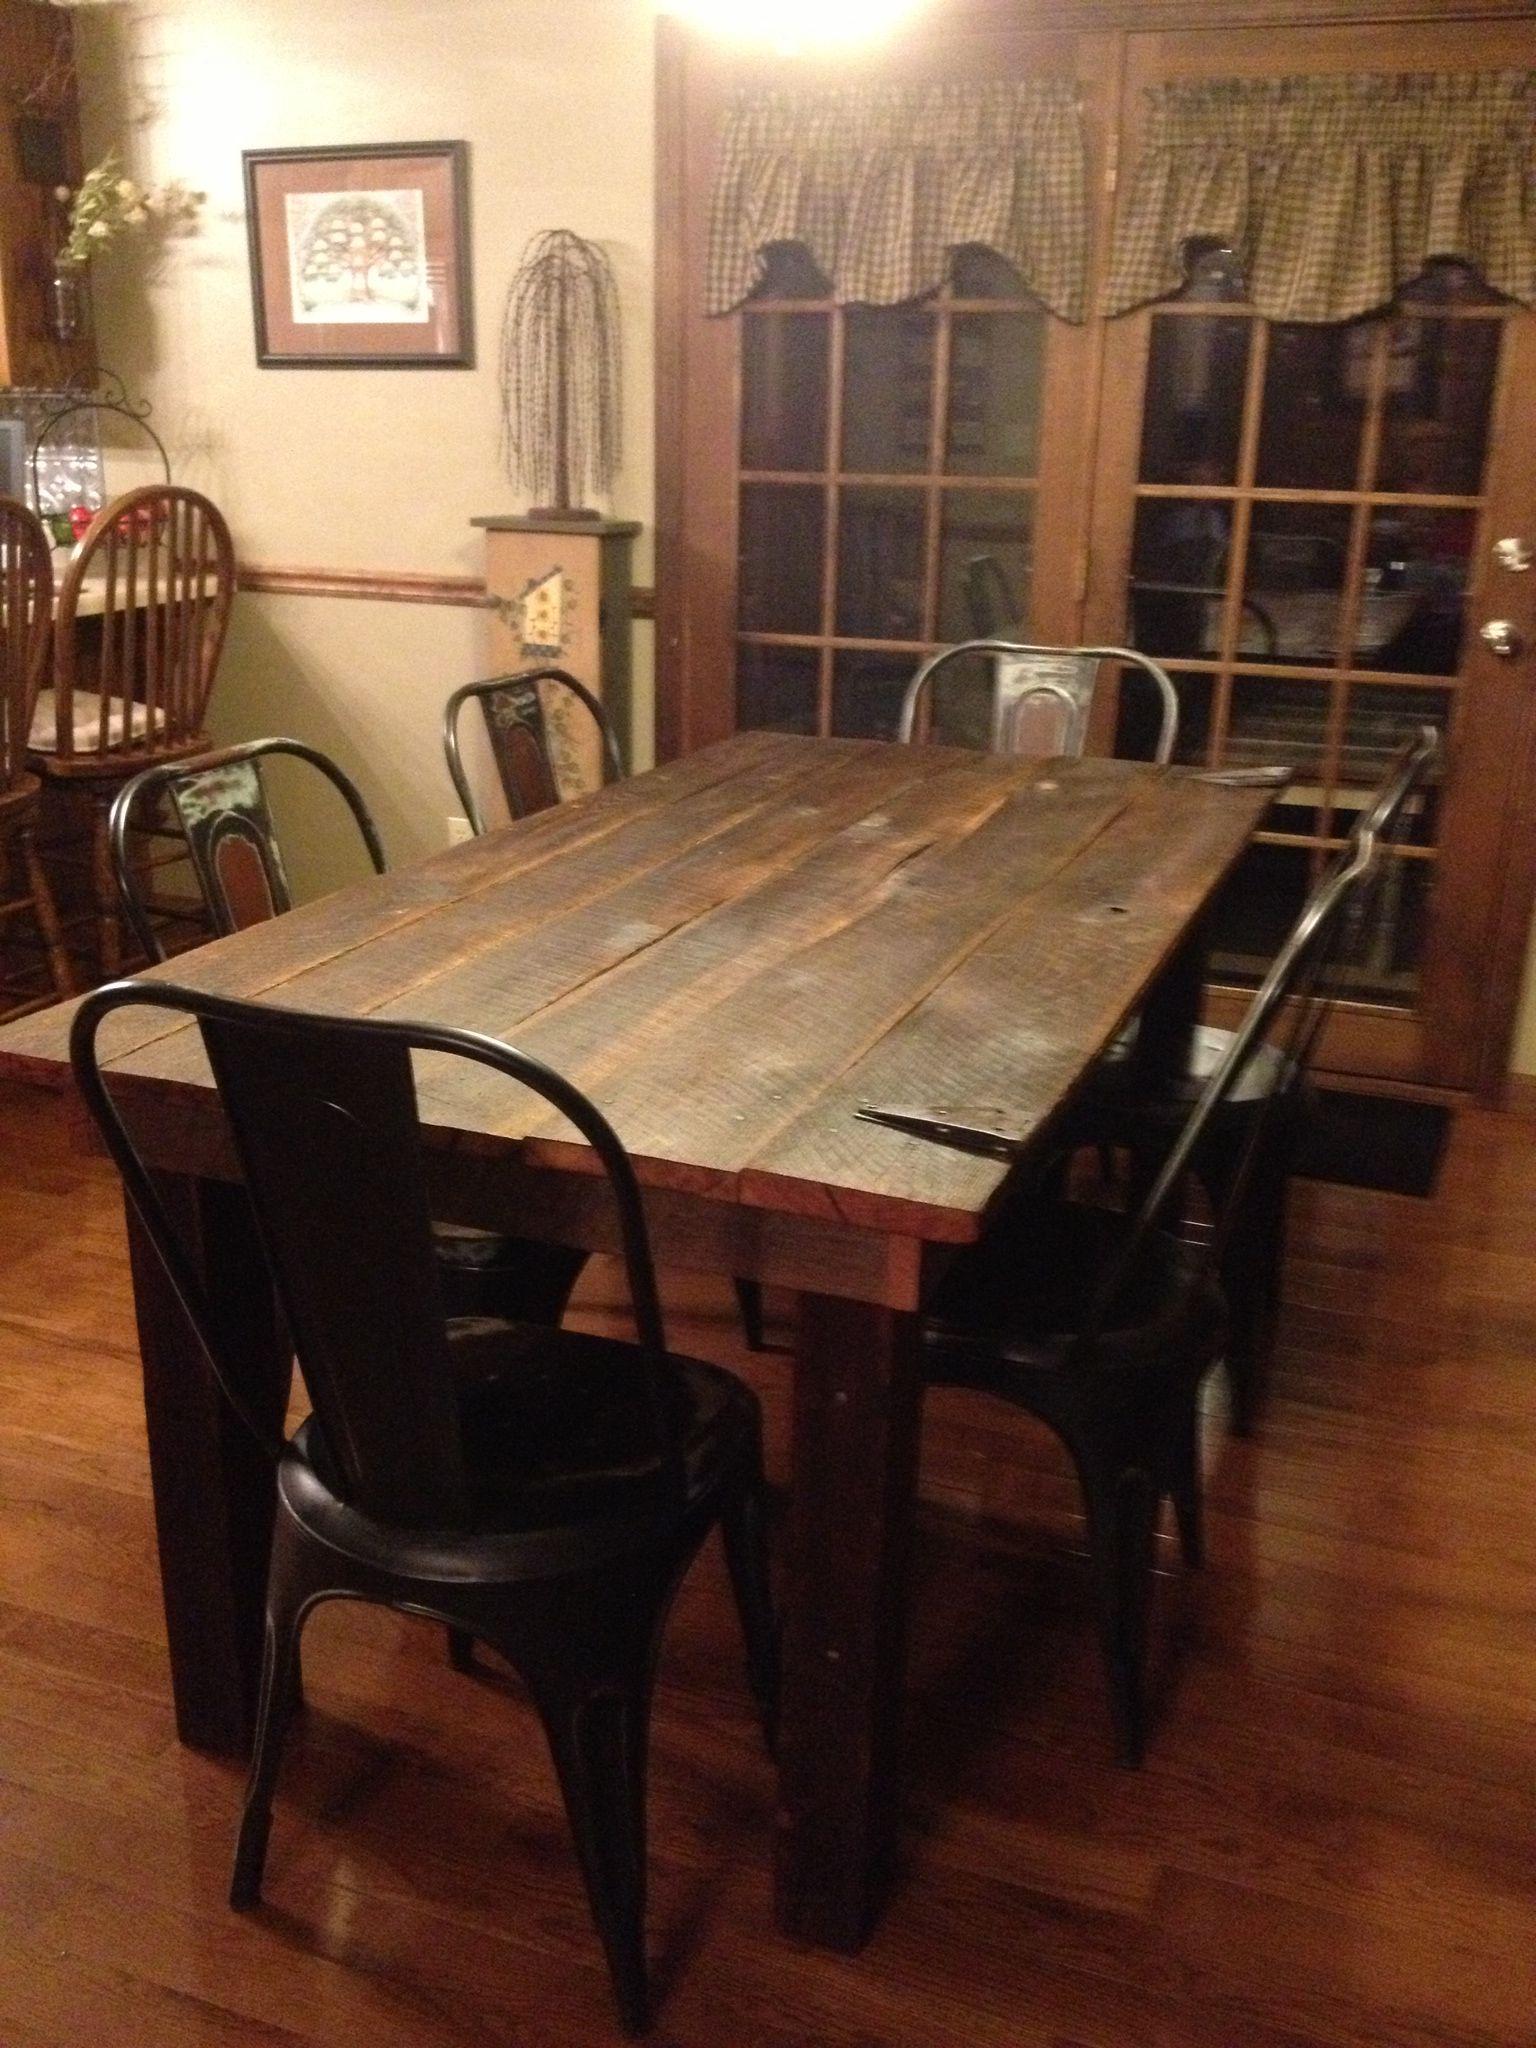 Old barn door dining room table vintage pinterest for Barn door dining room